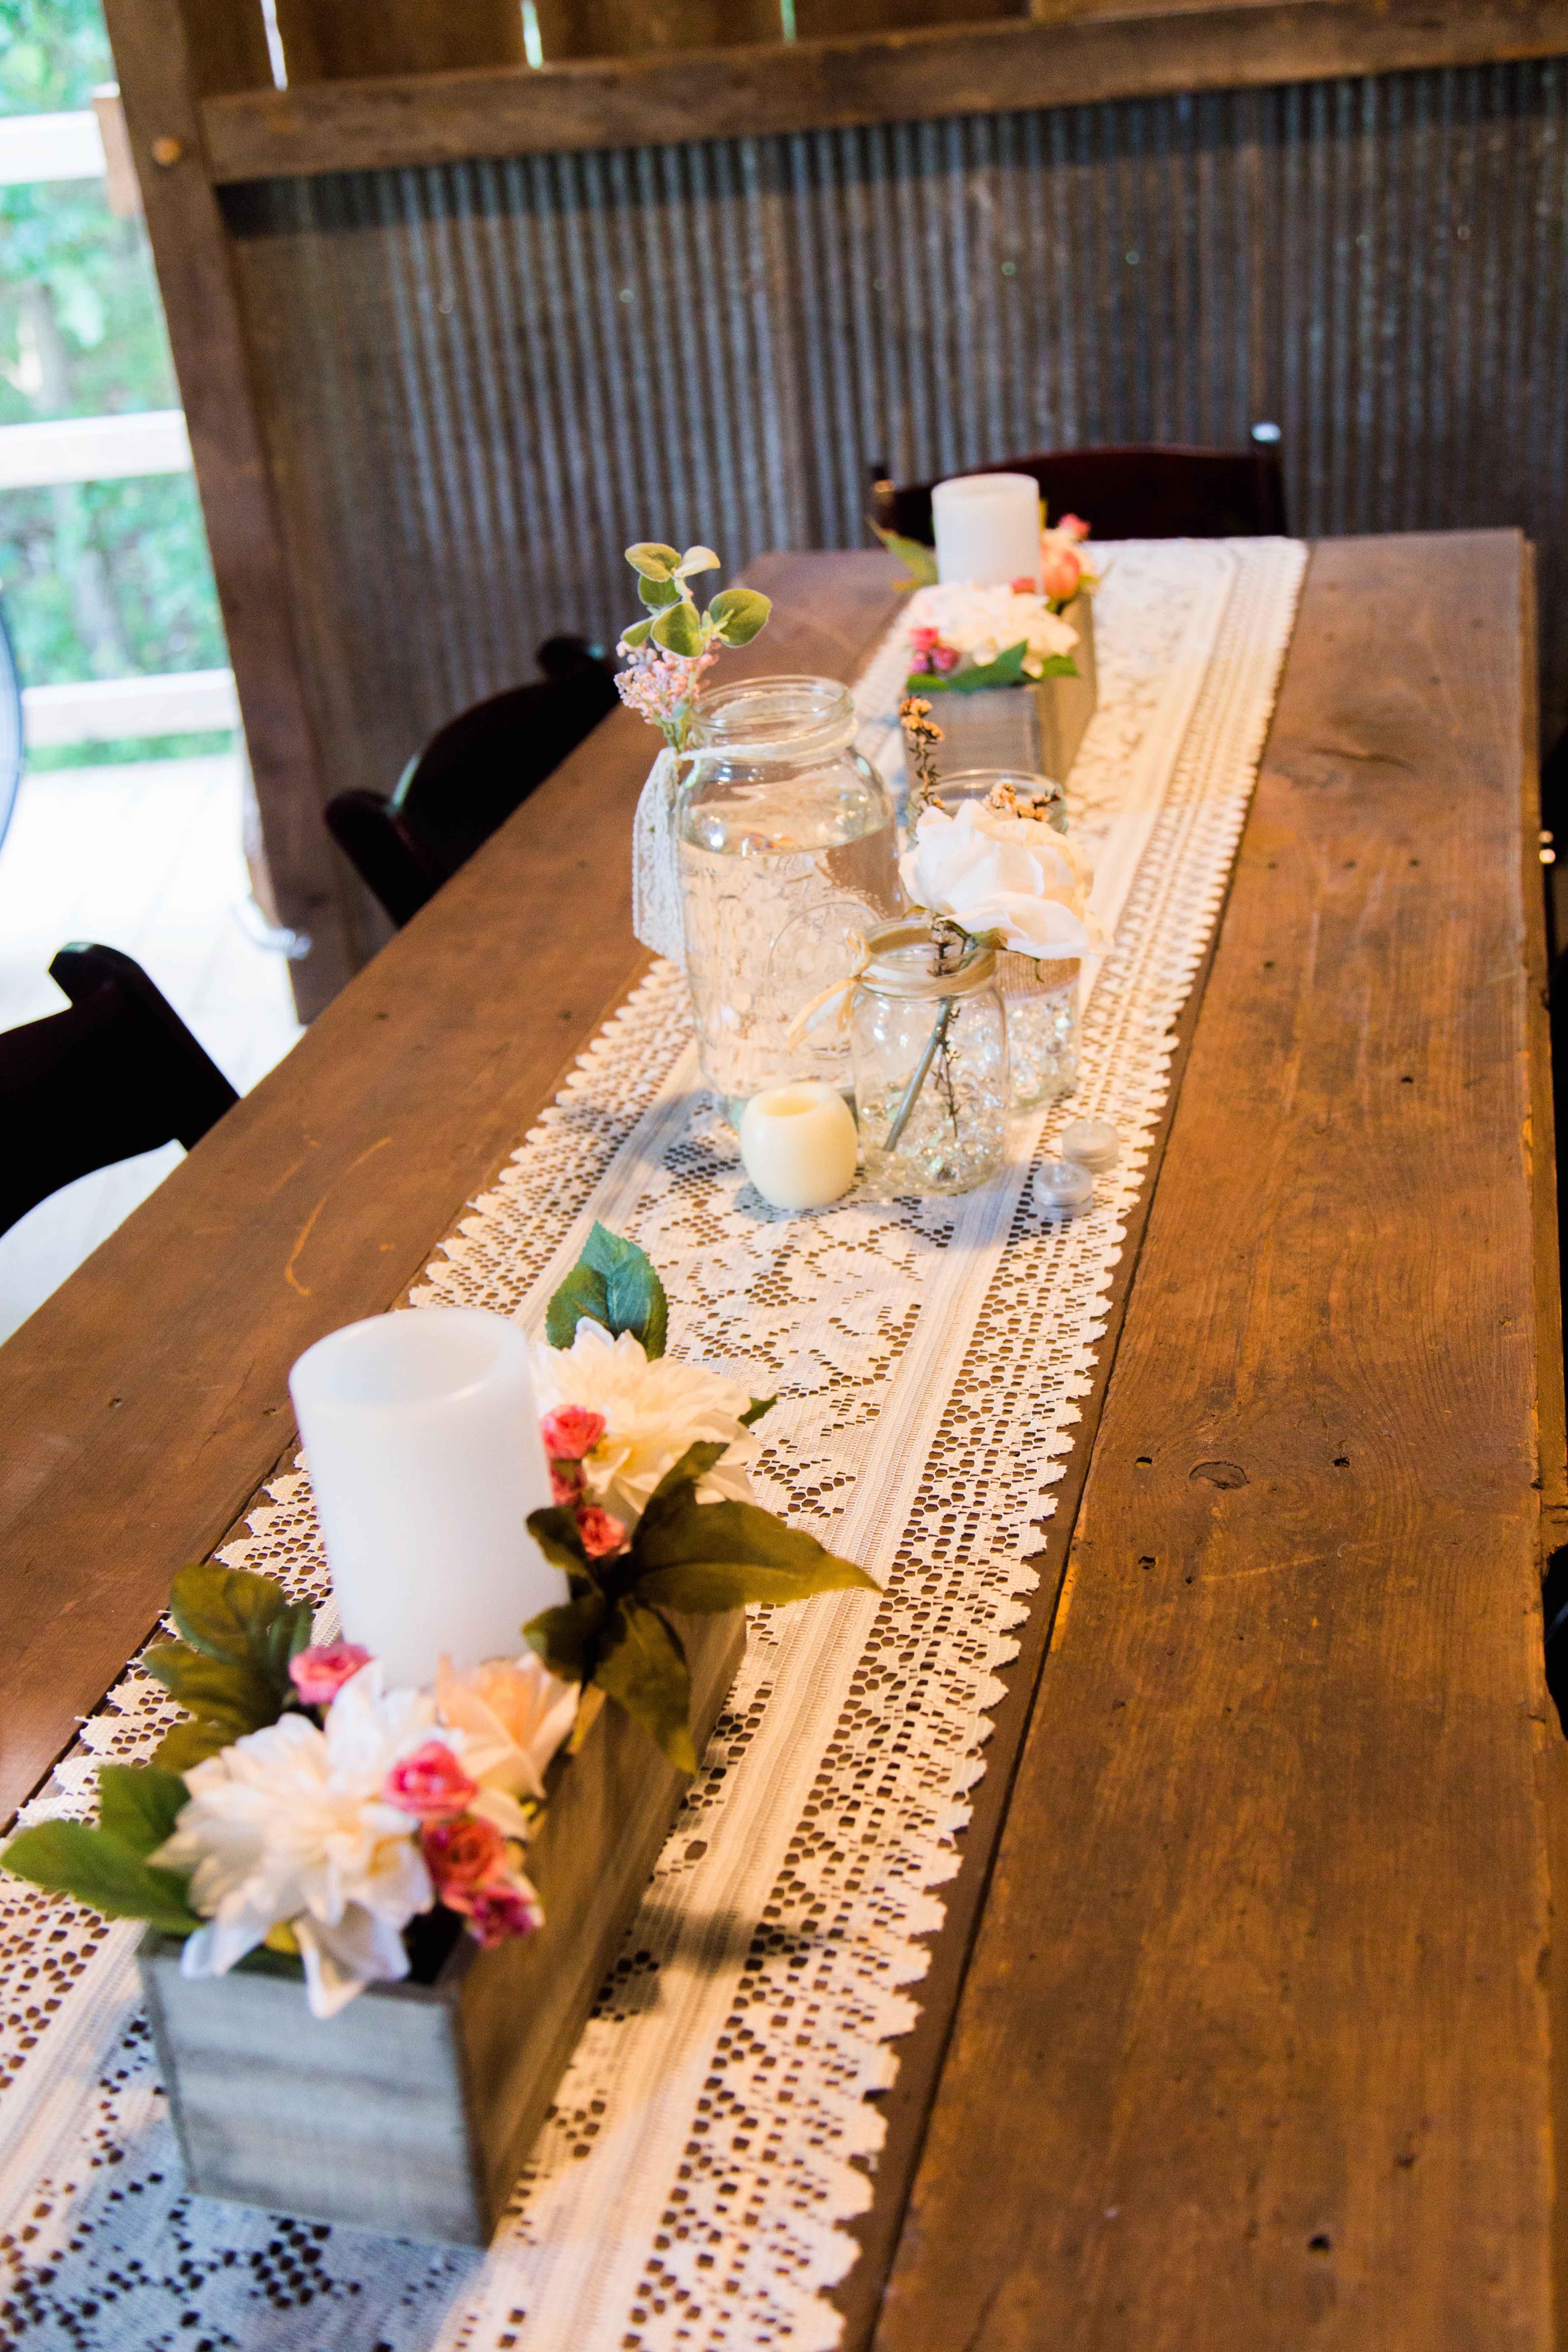 favorite pottery ideas decor decorating barn inspiration room photos fall dining interior home